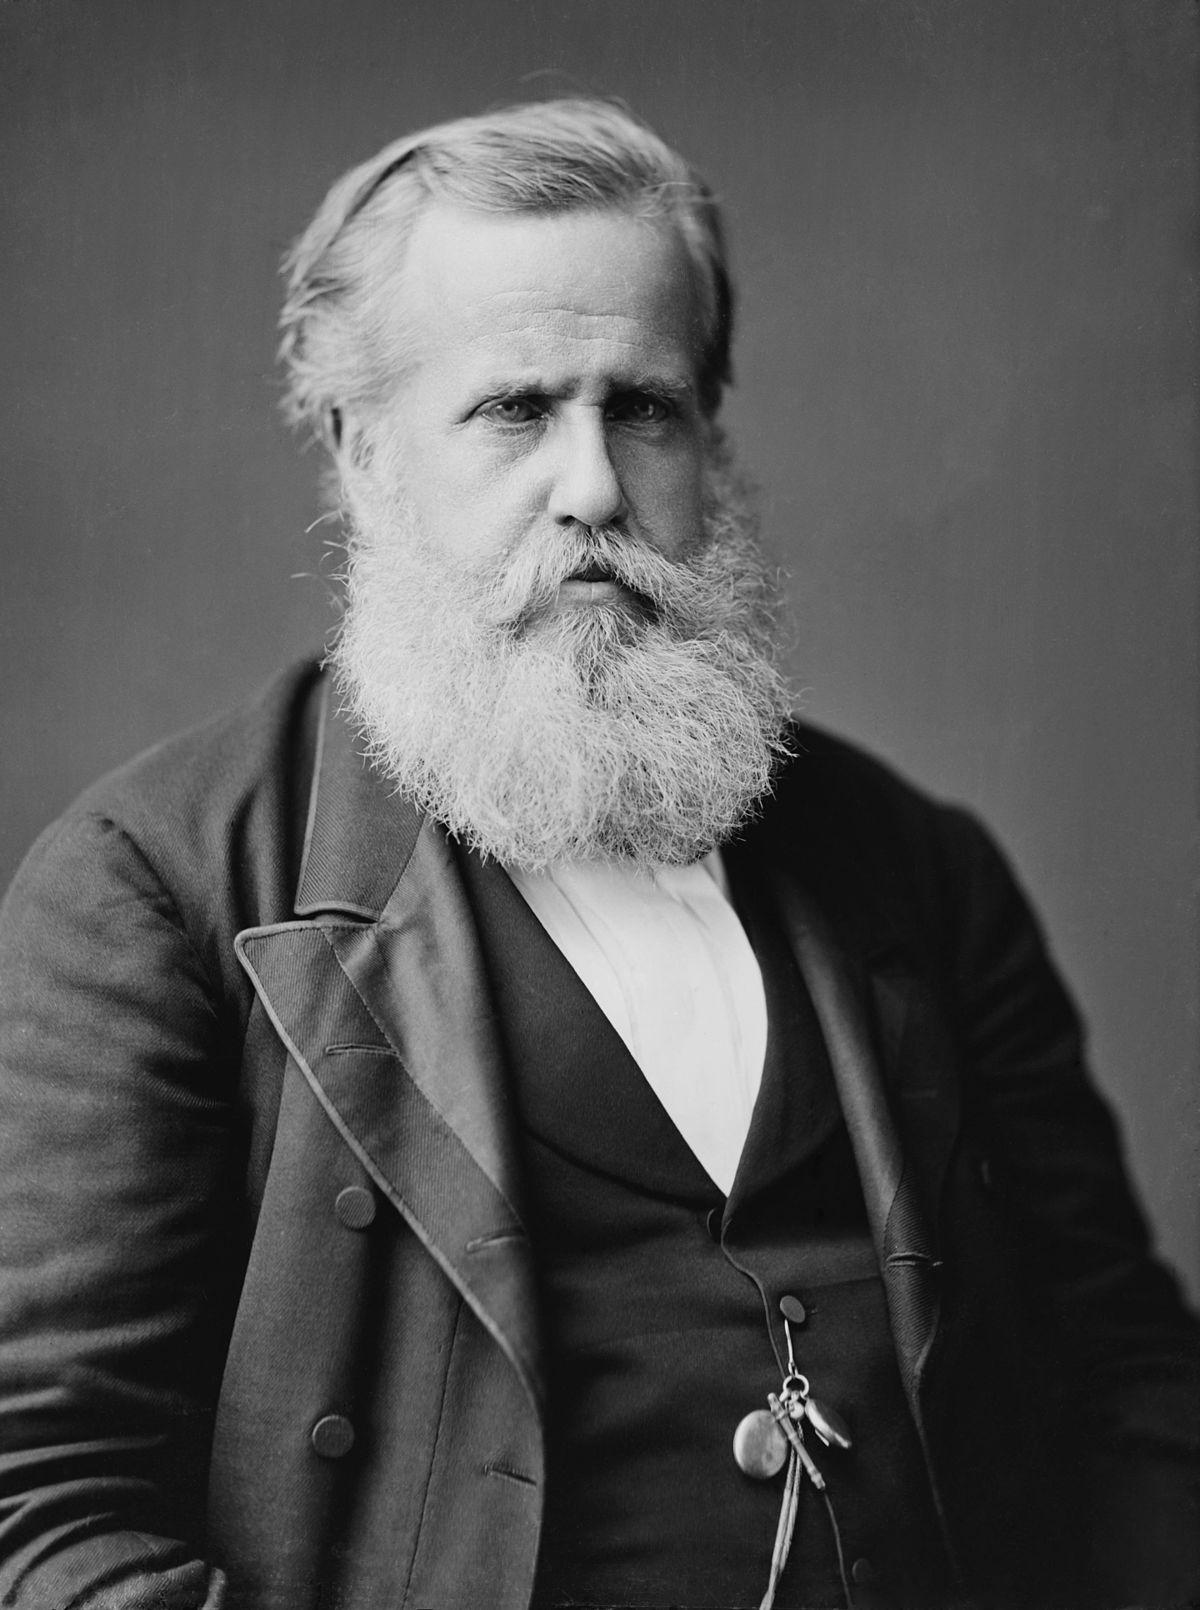 Pedro II of Brazil - Brady-Handy.jpg